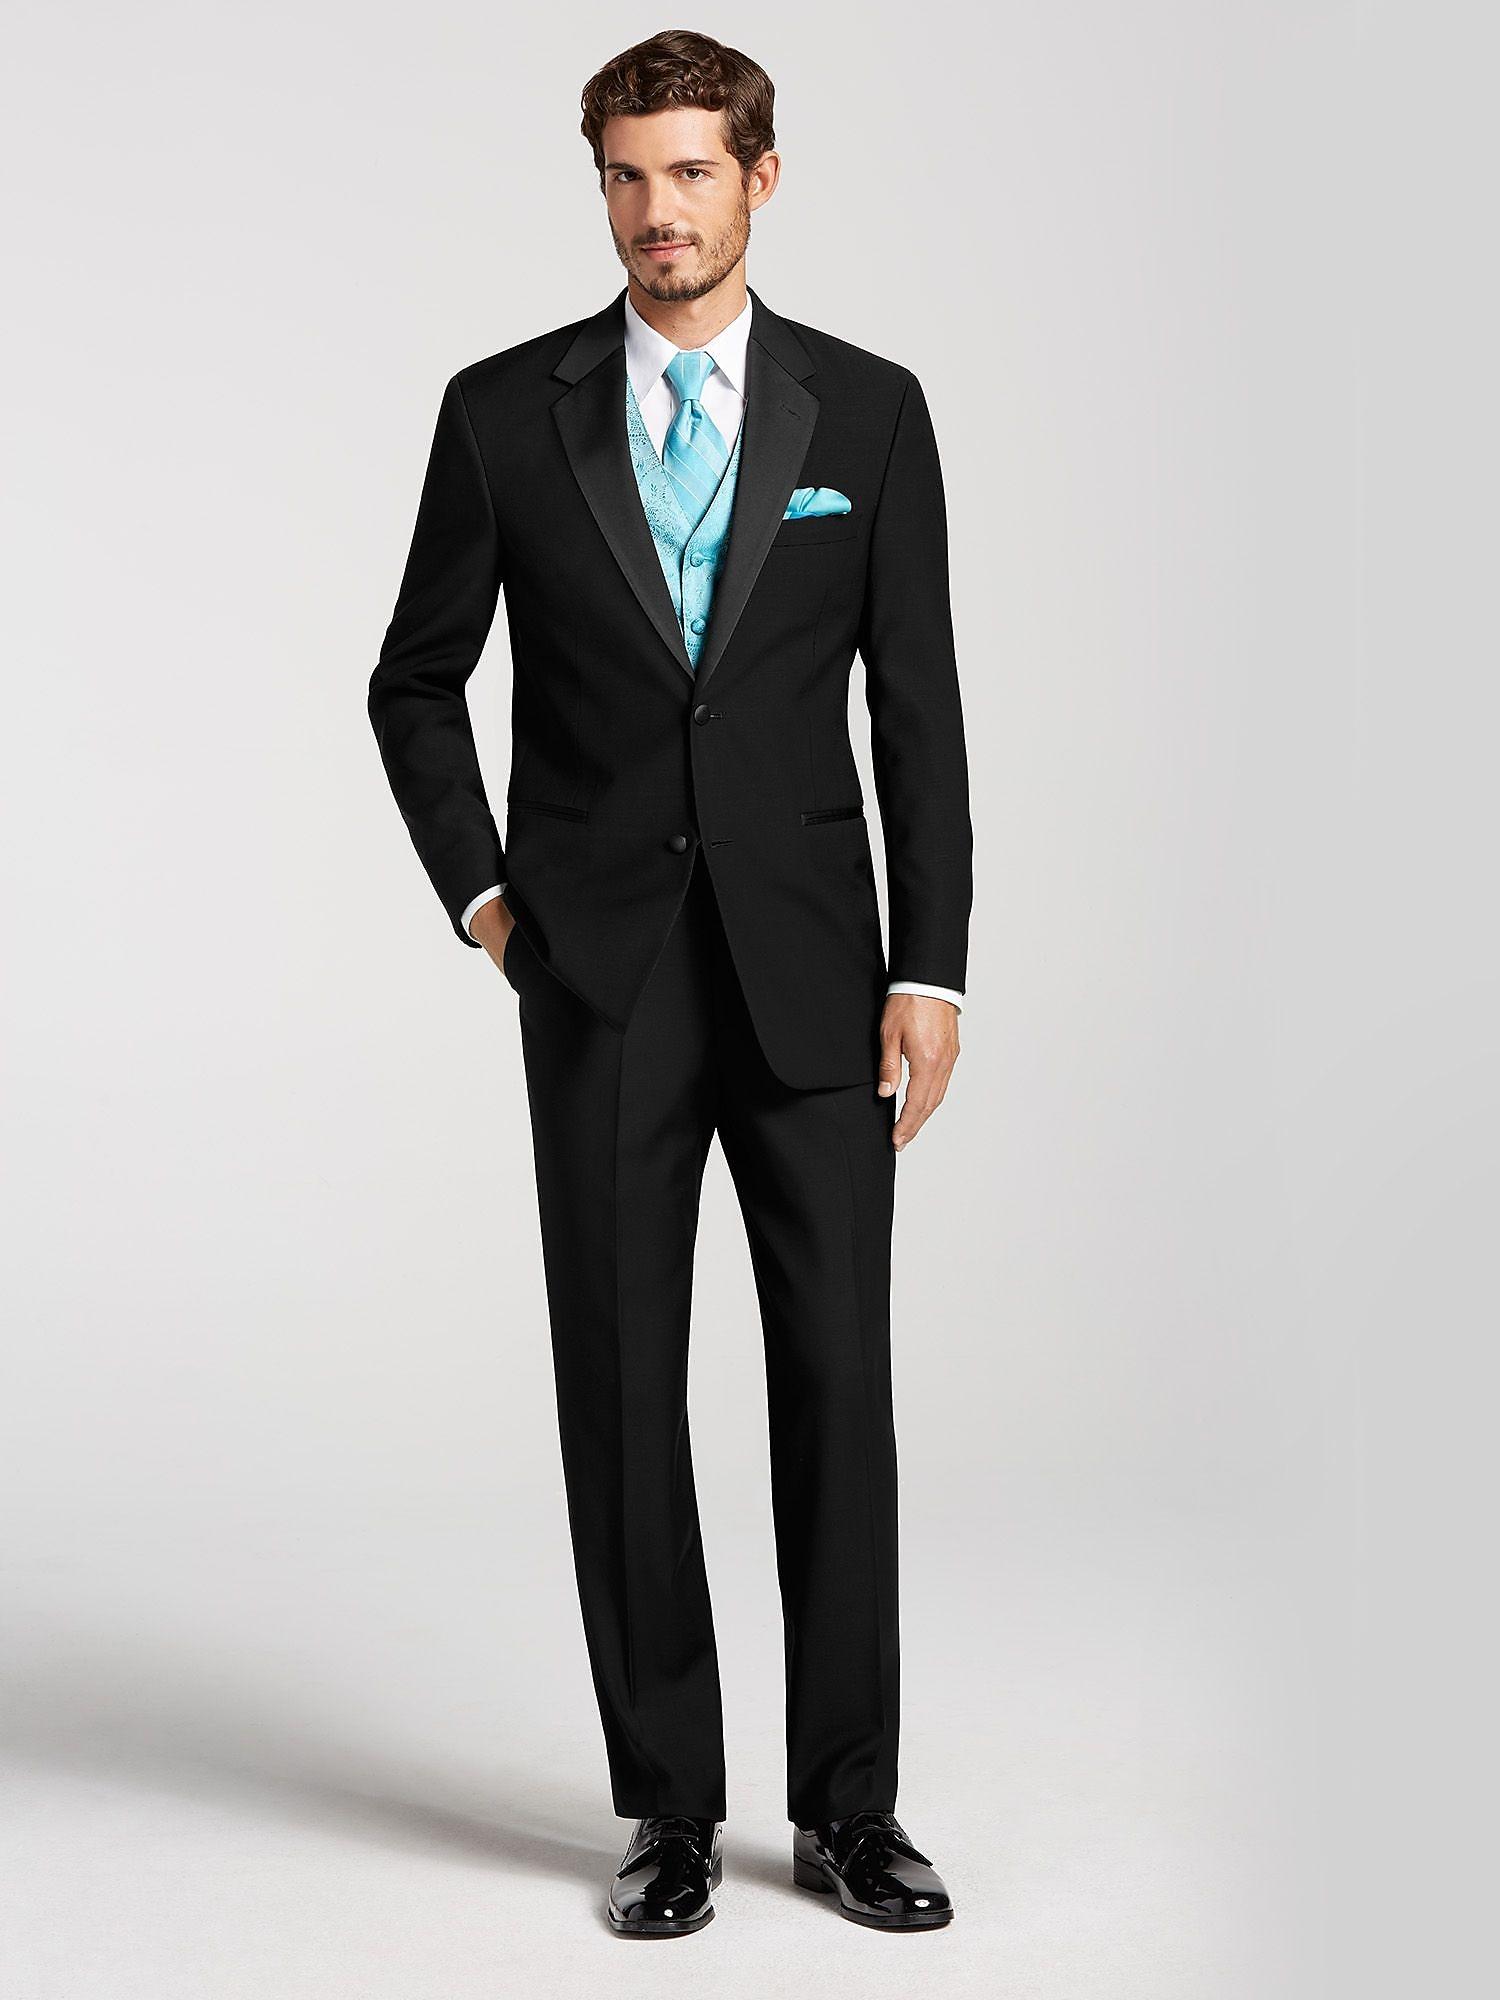 Two button black tuxedo by calvin klein tuxedo rental for Tuxedo house